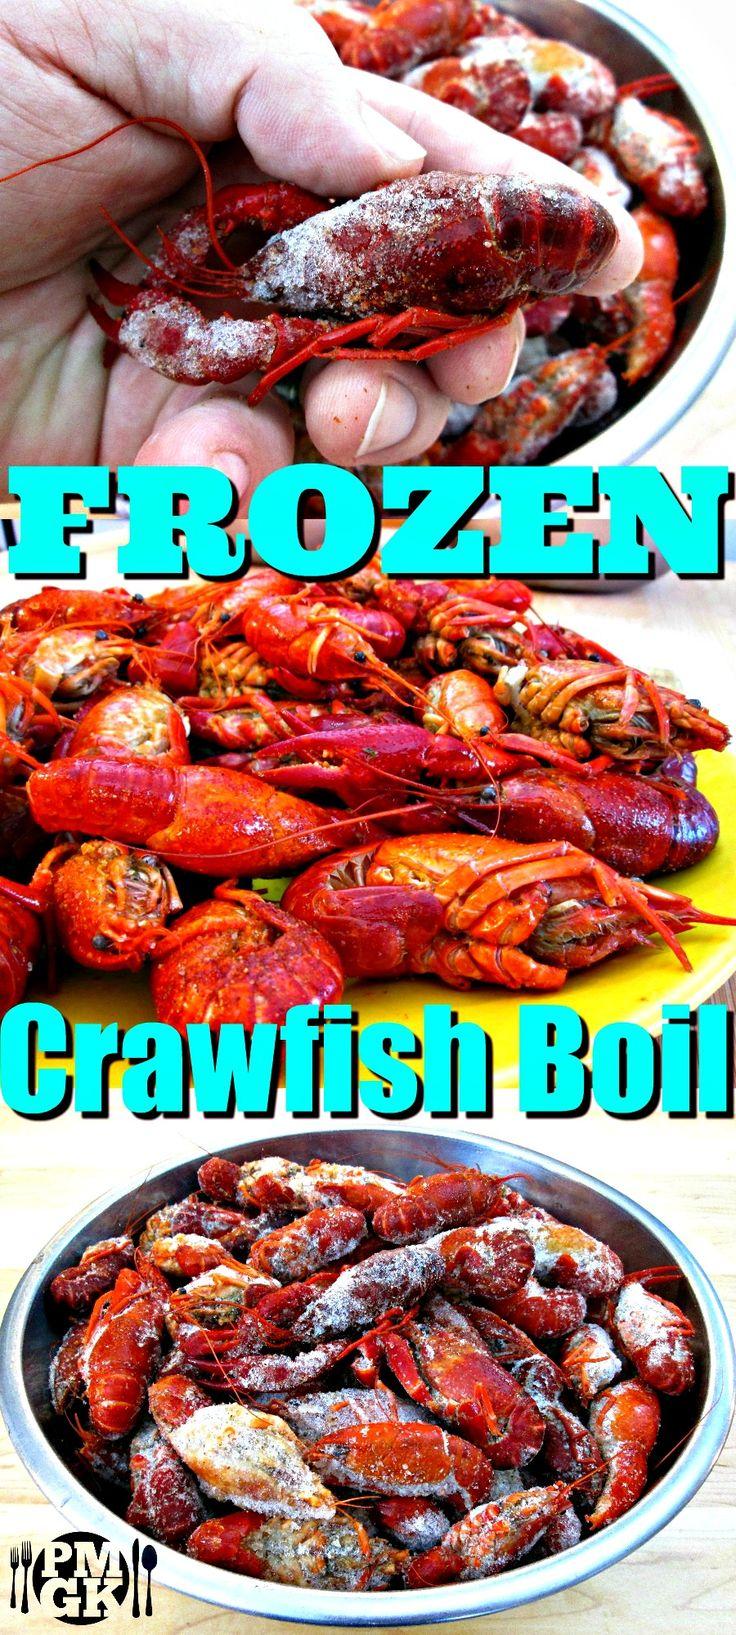 Frozen crawfish boil how to cook frozen crawfish